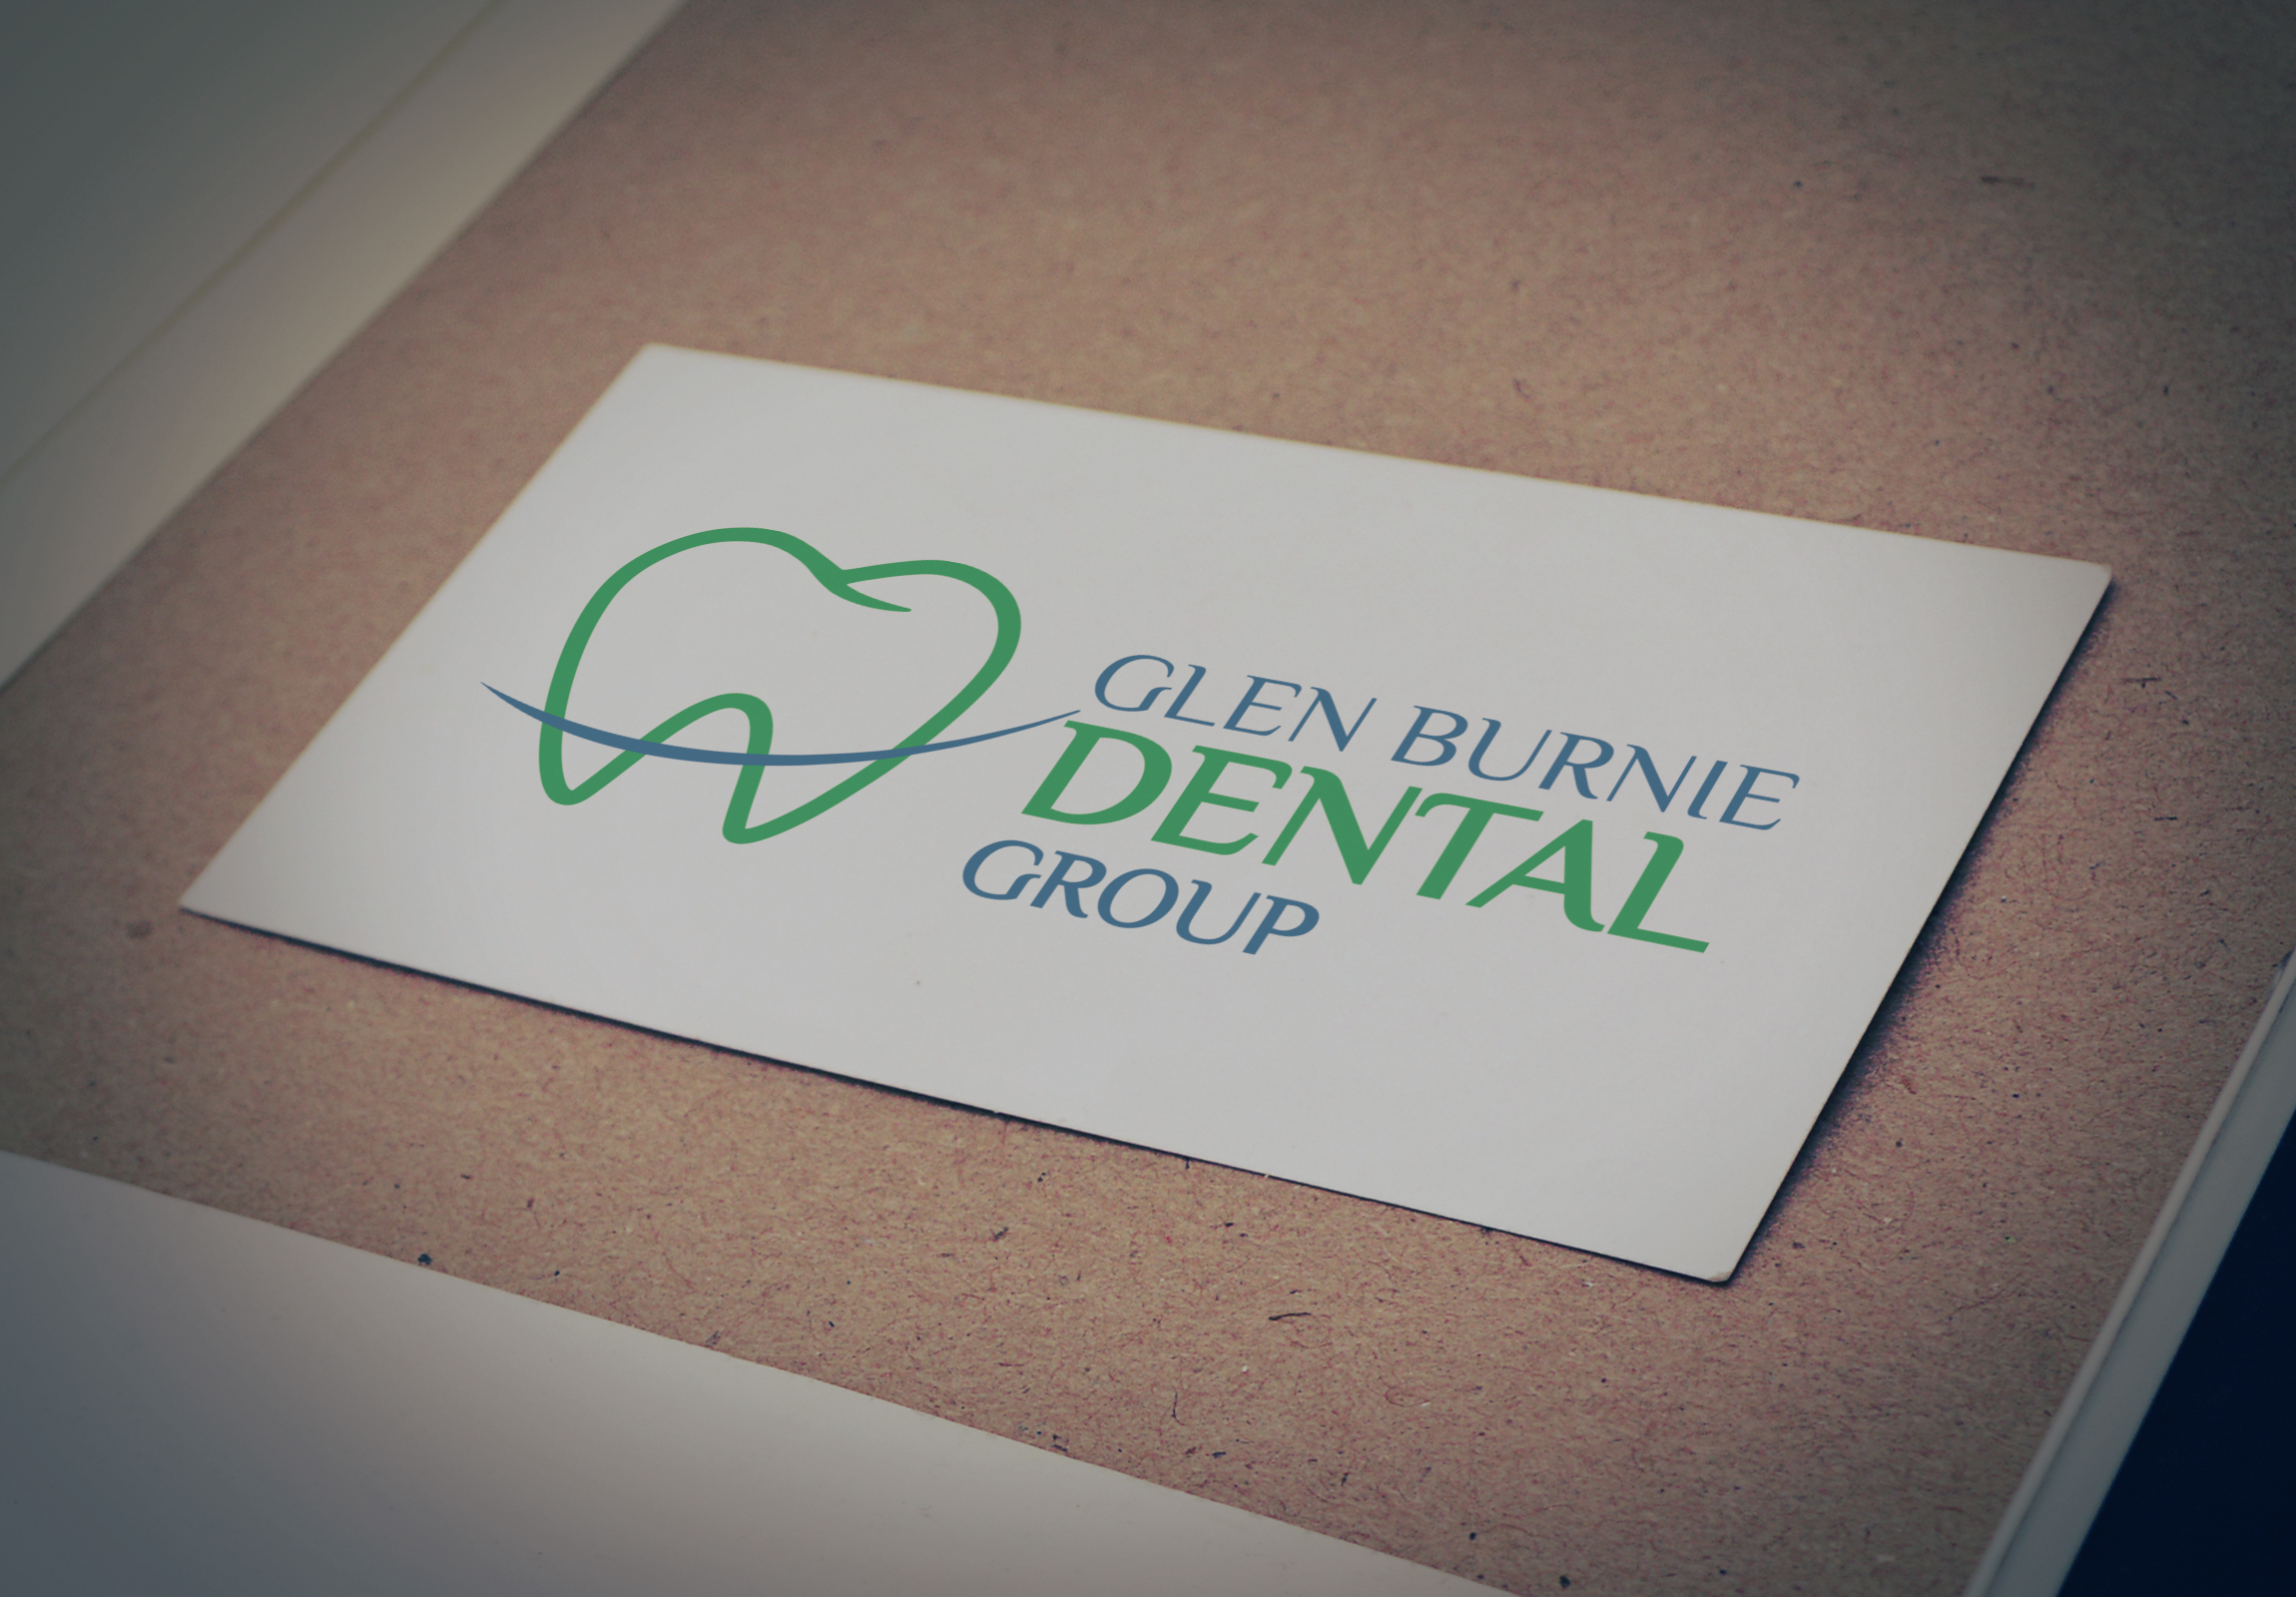 Логотип для Glen Burnie Dental Group